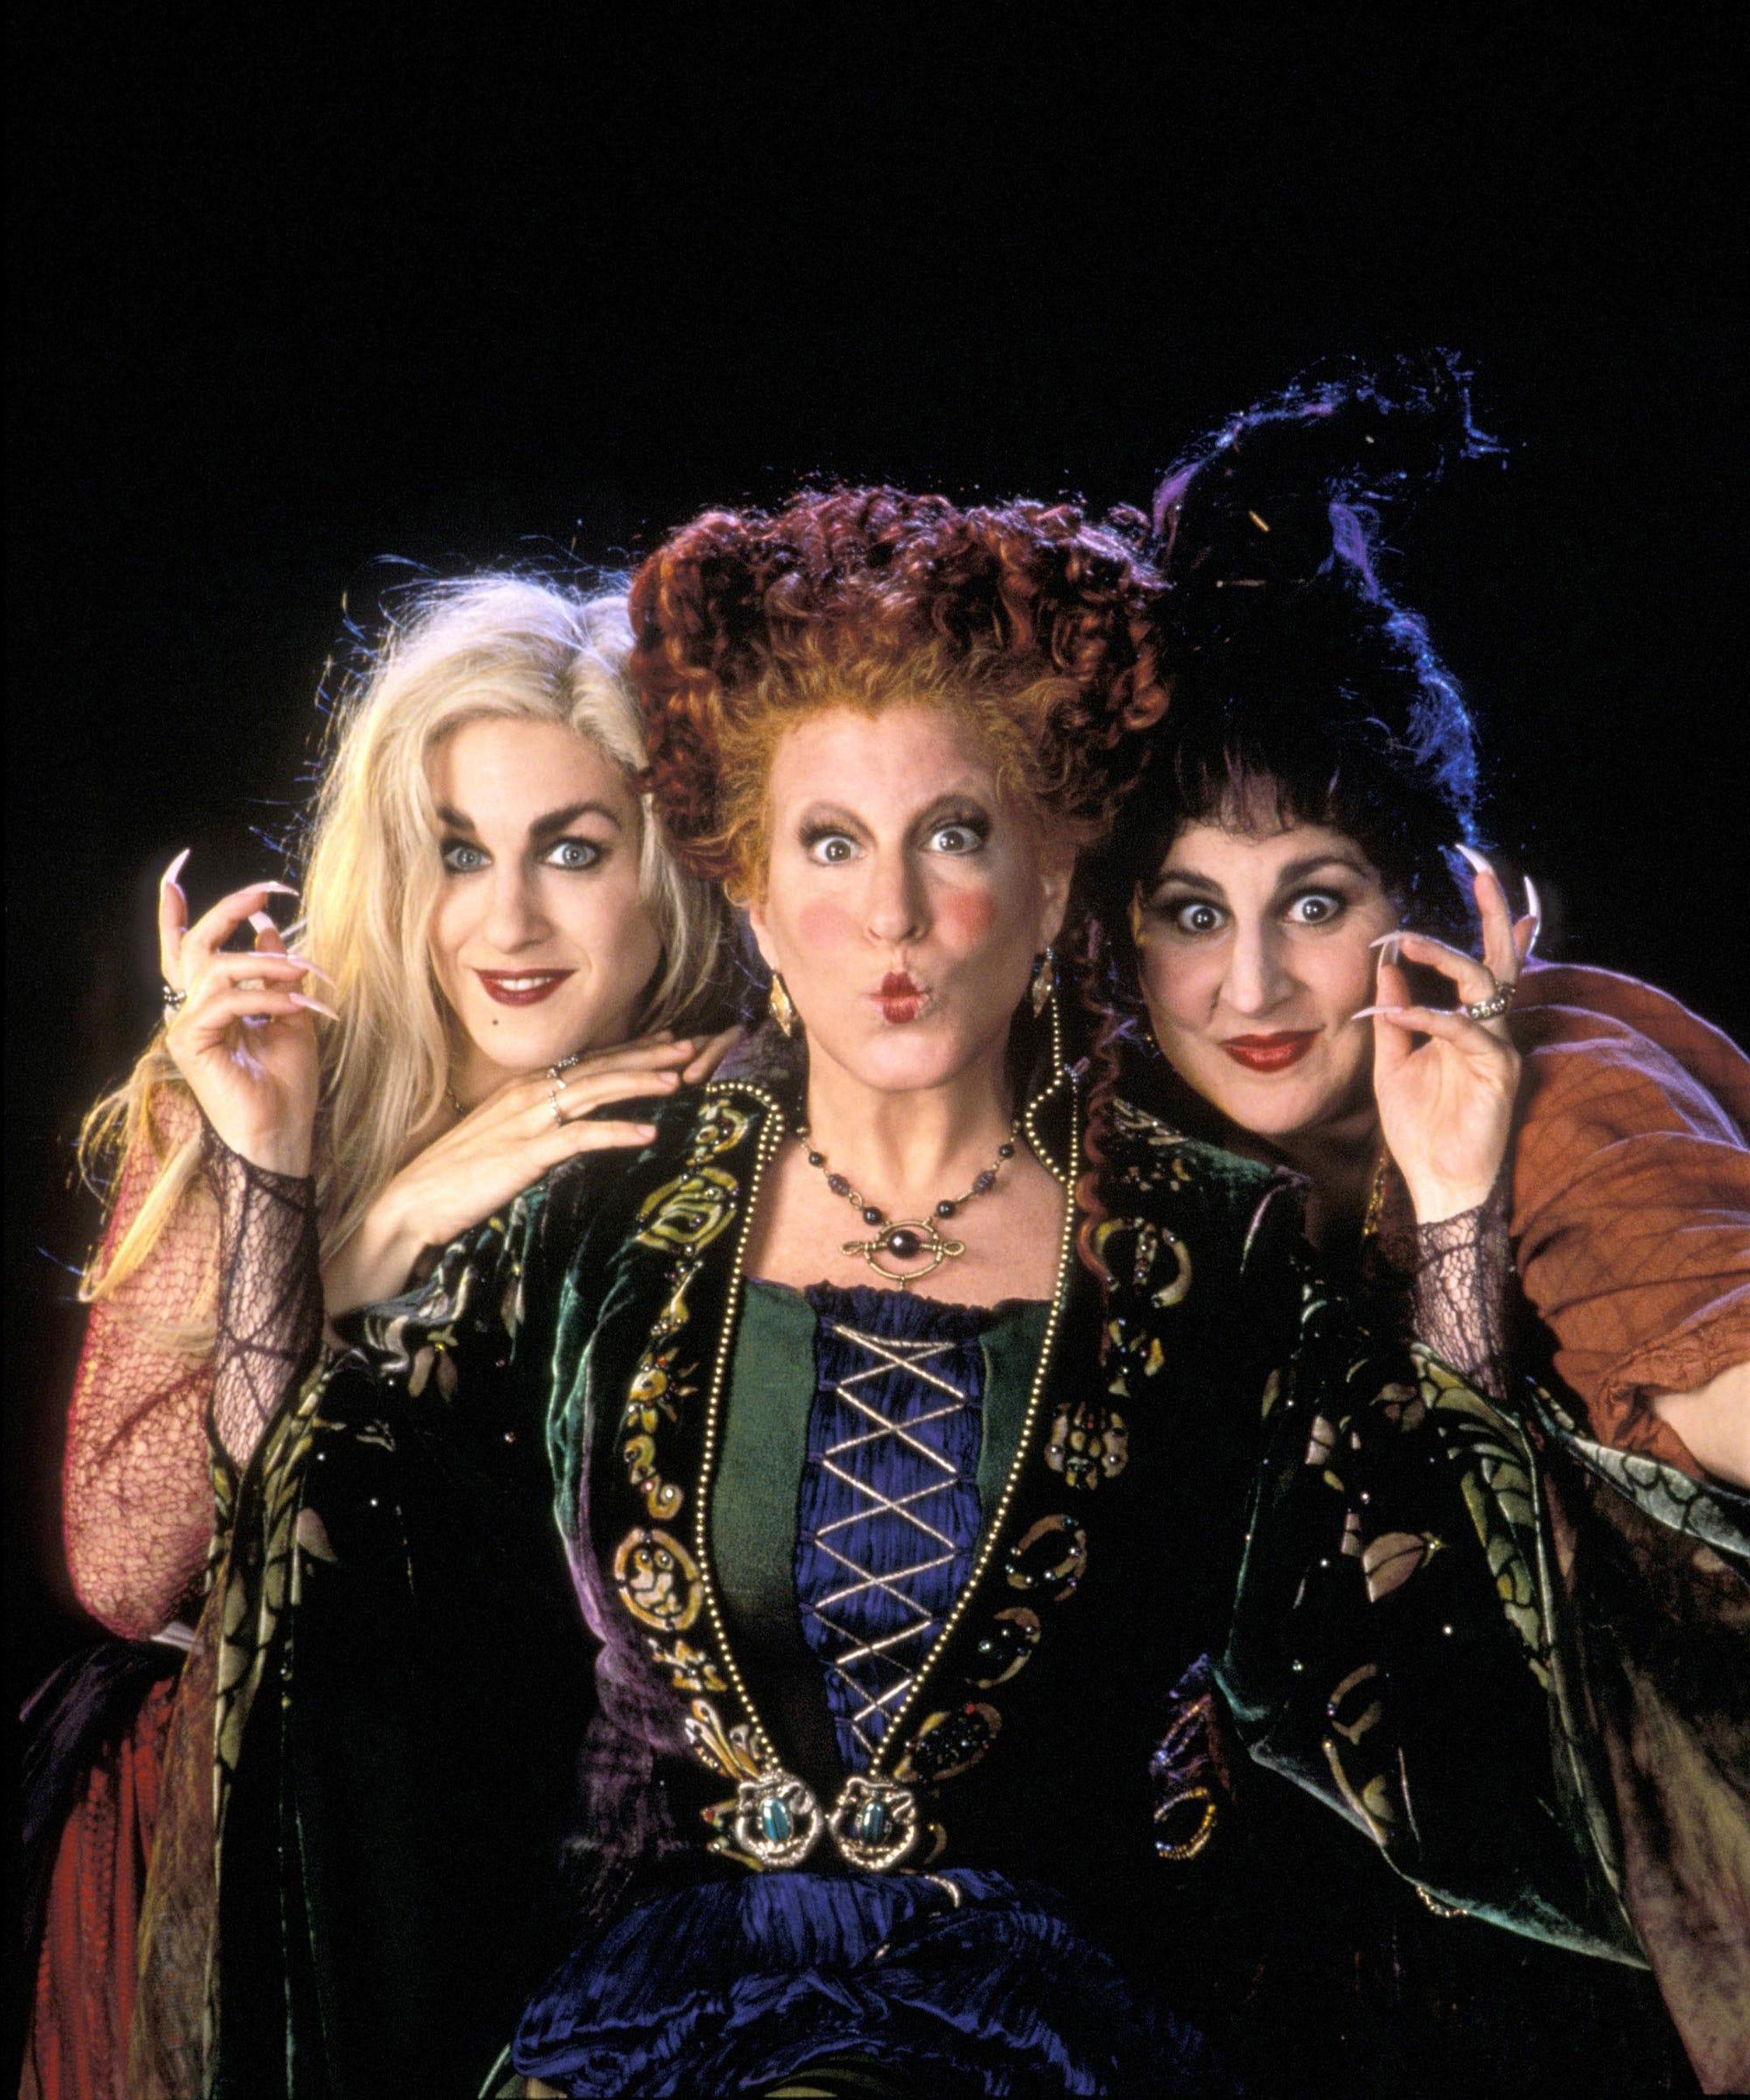 hocus pocus movie cast 2018 where are they now - A Golden Christmas Cast